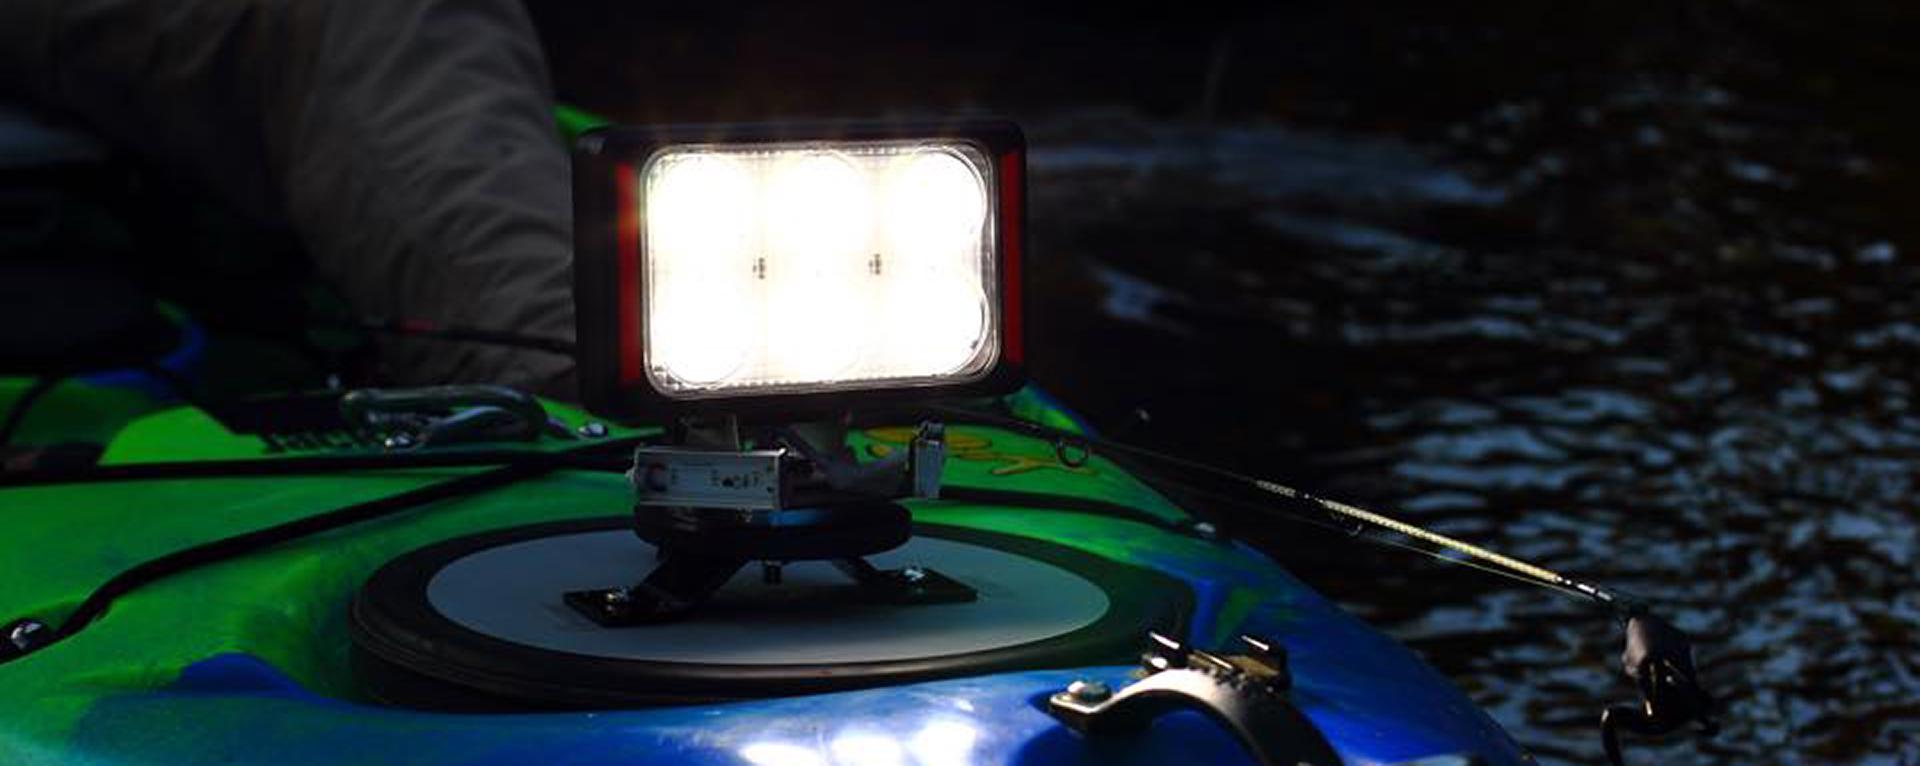 Yak Lights - Image 175